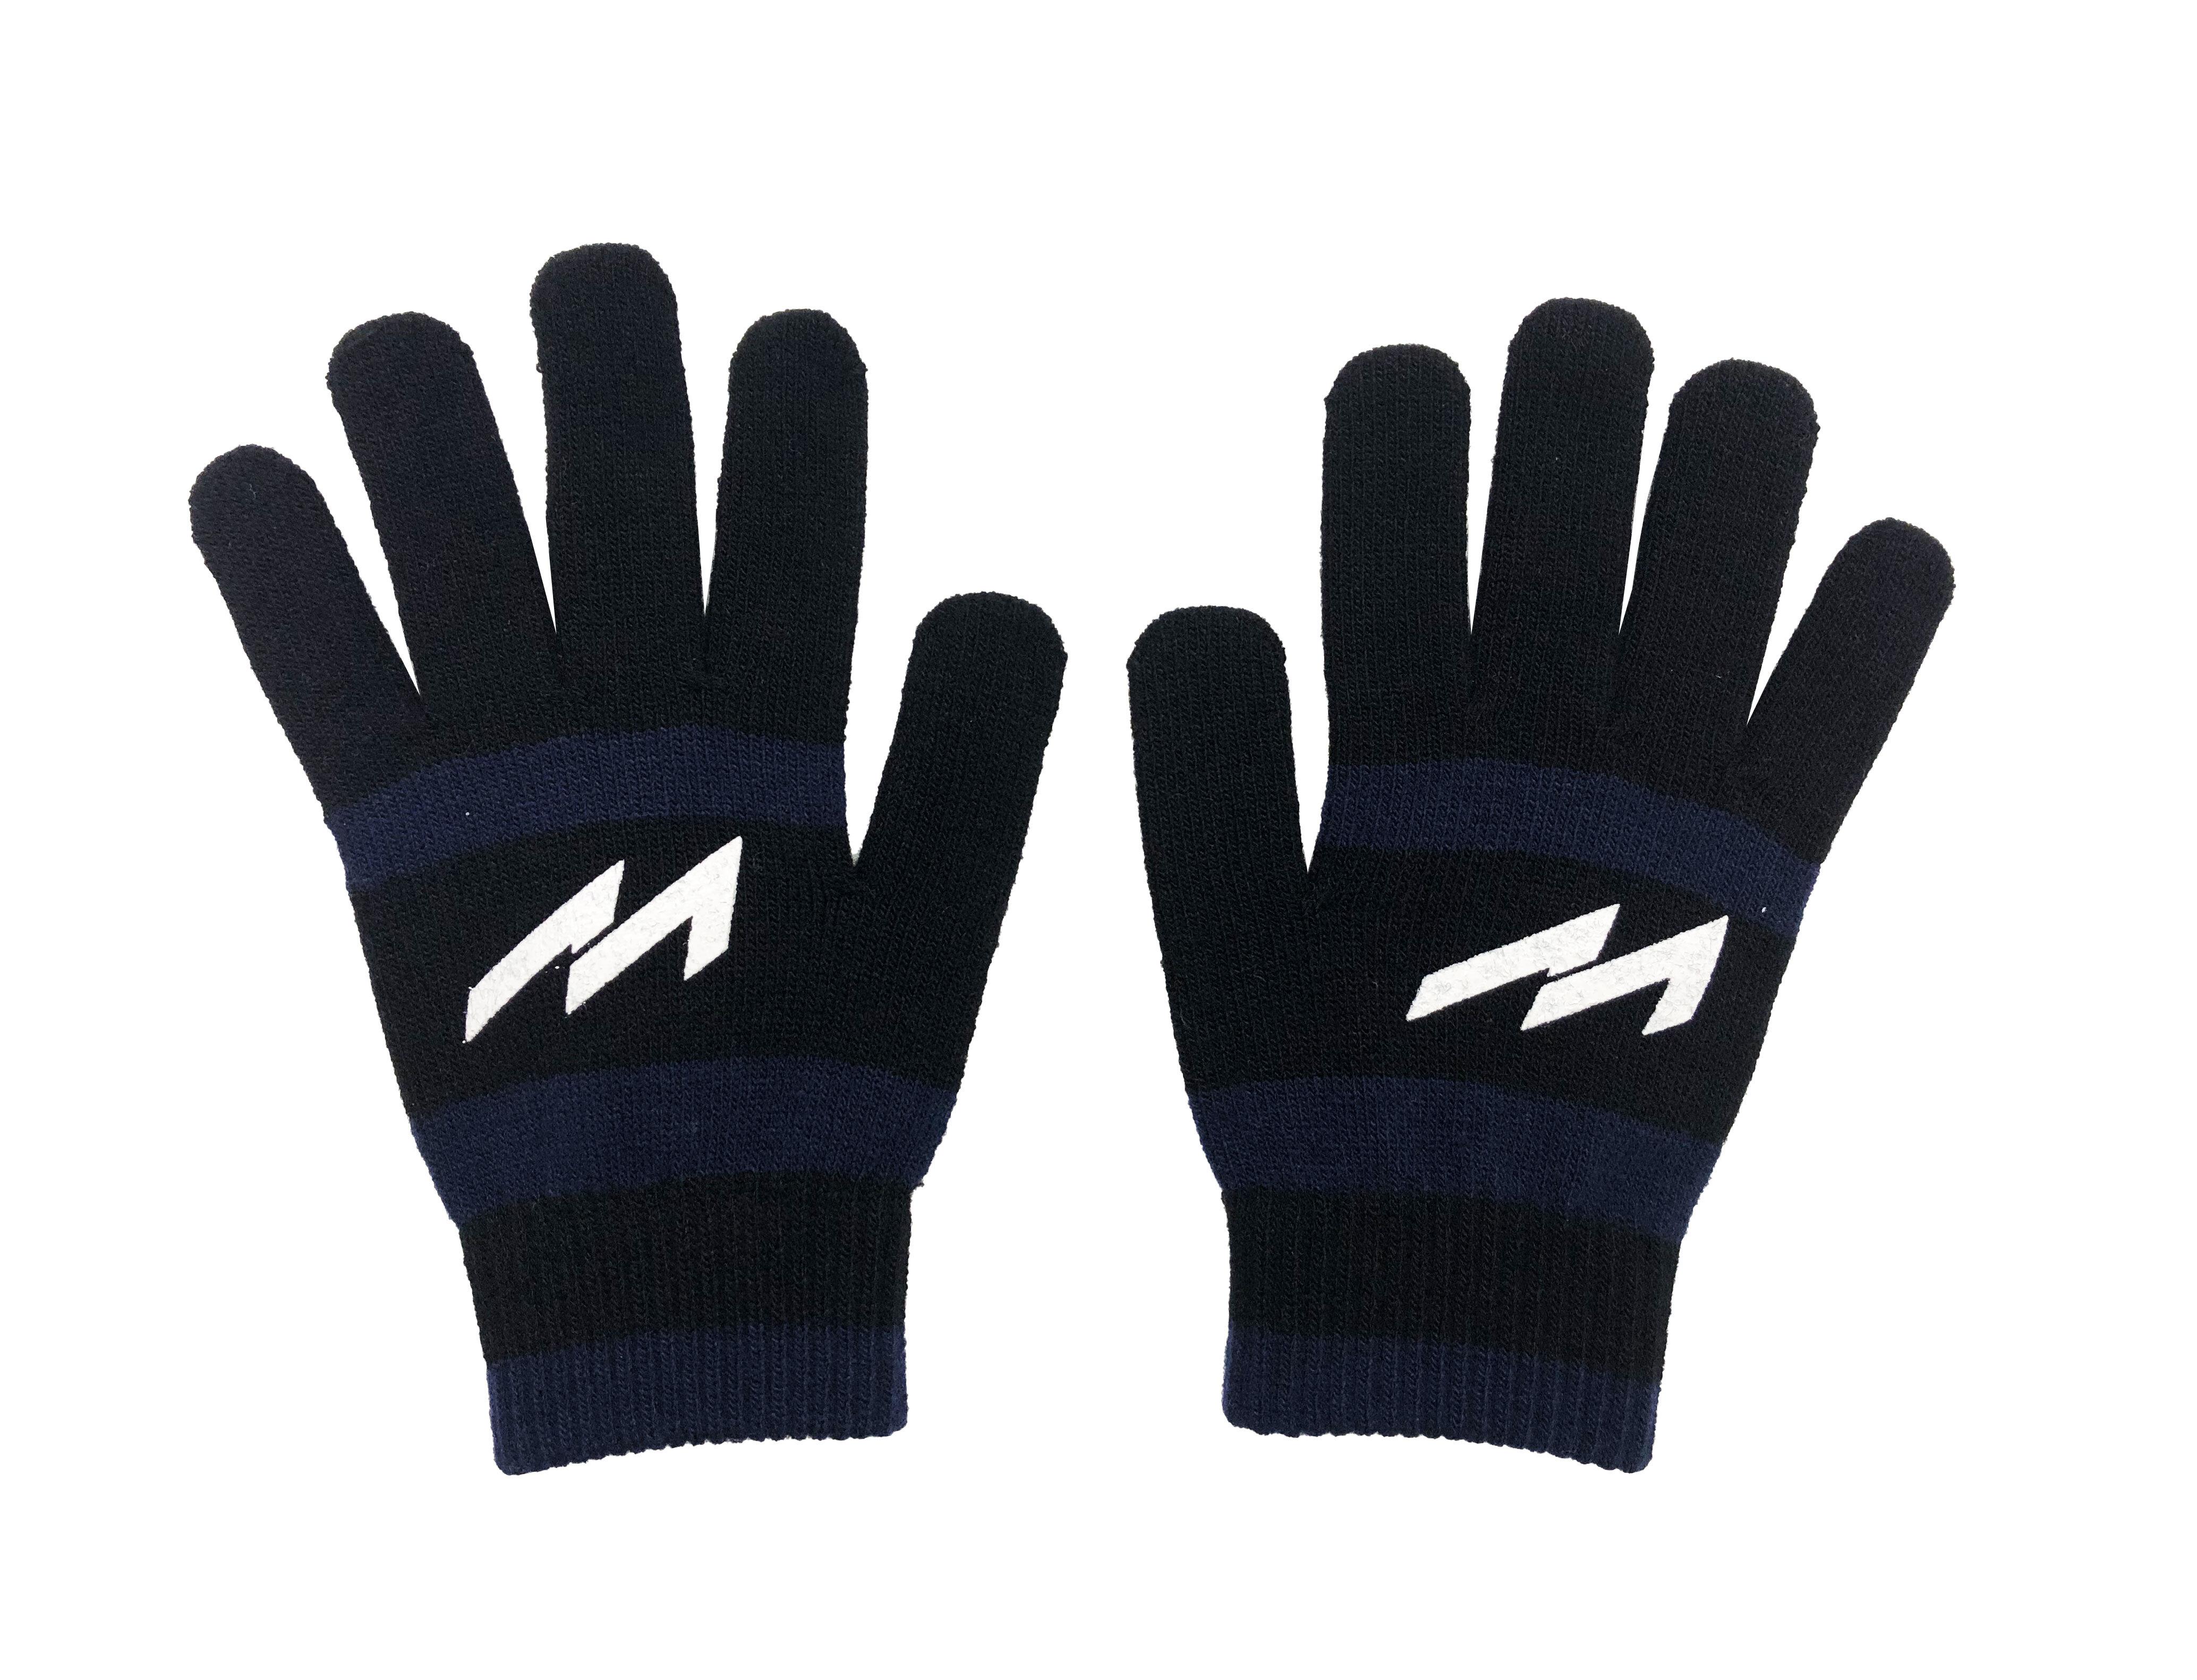 Knit Glove